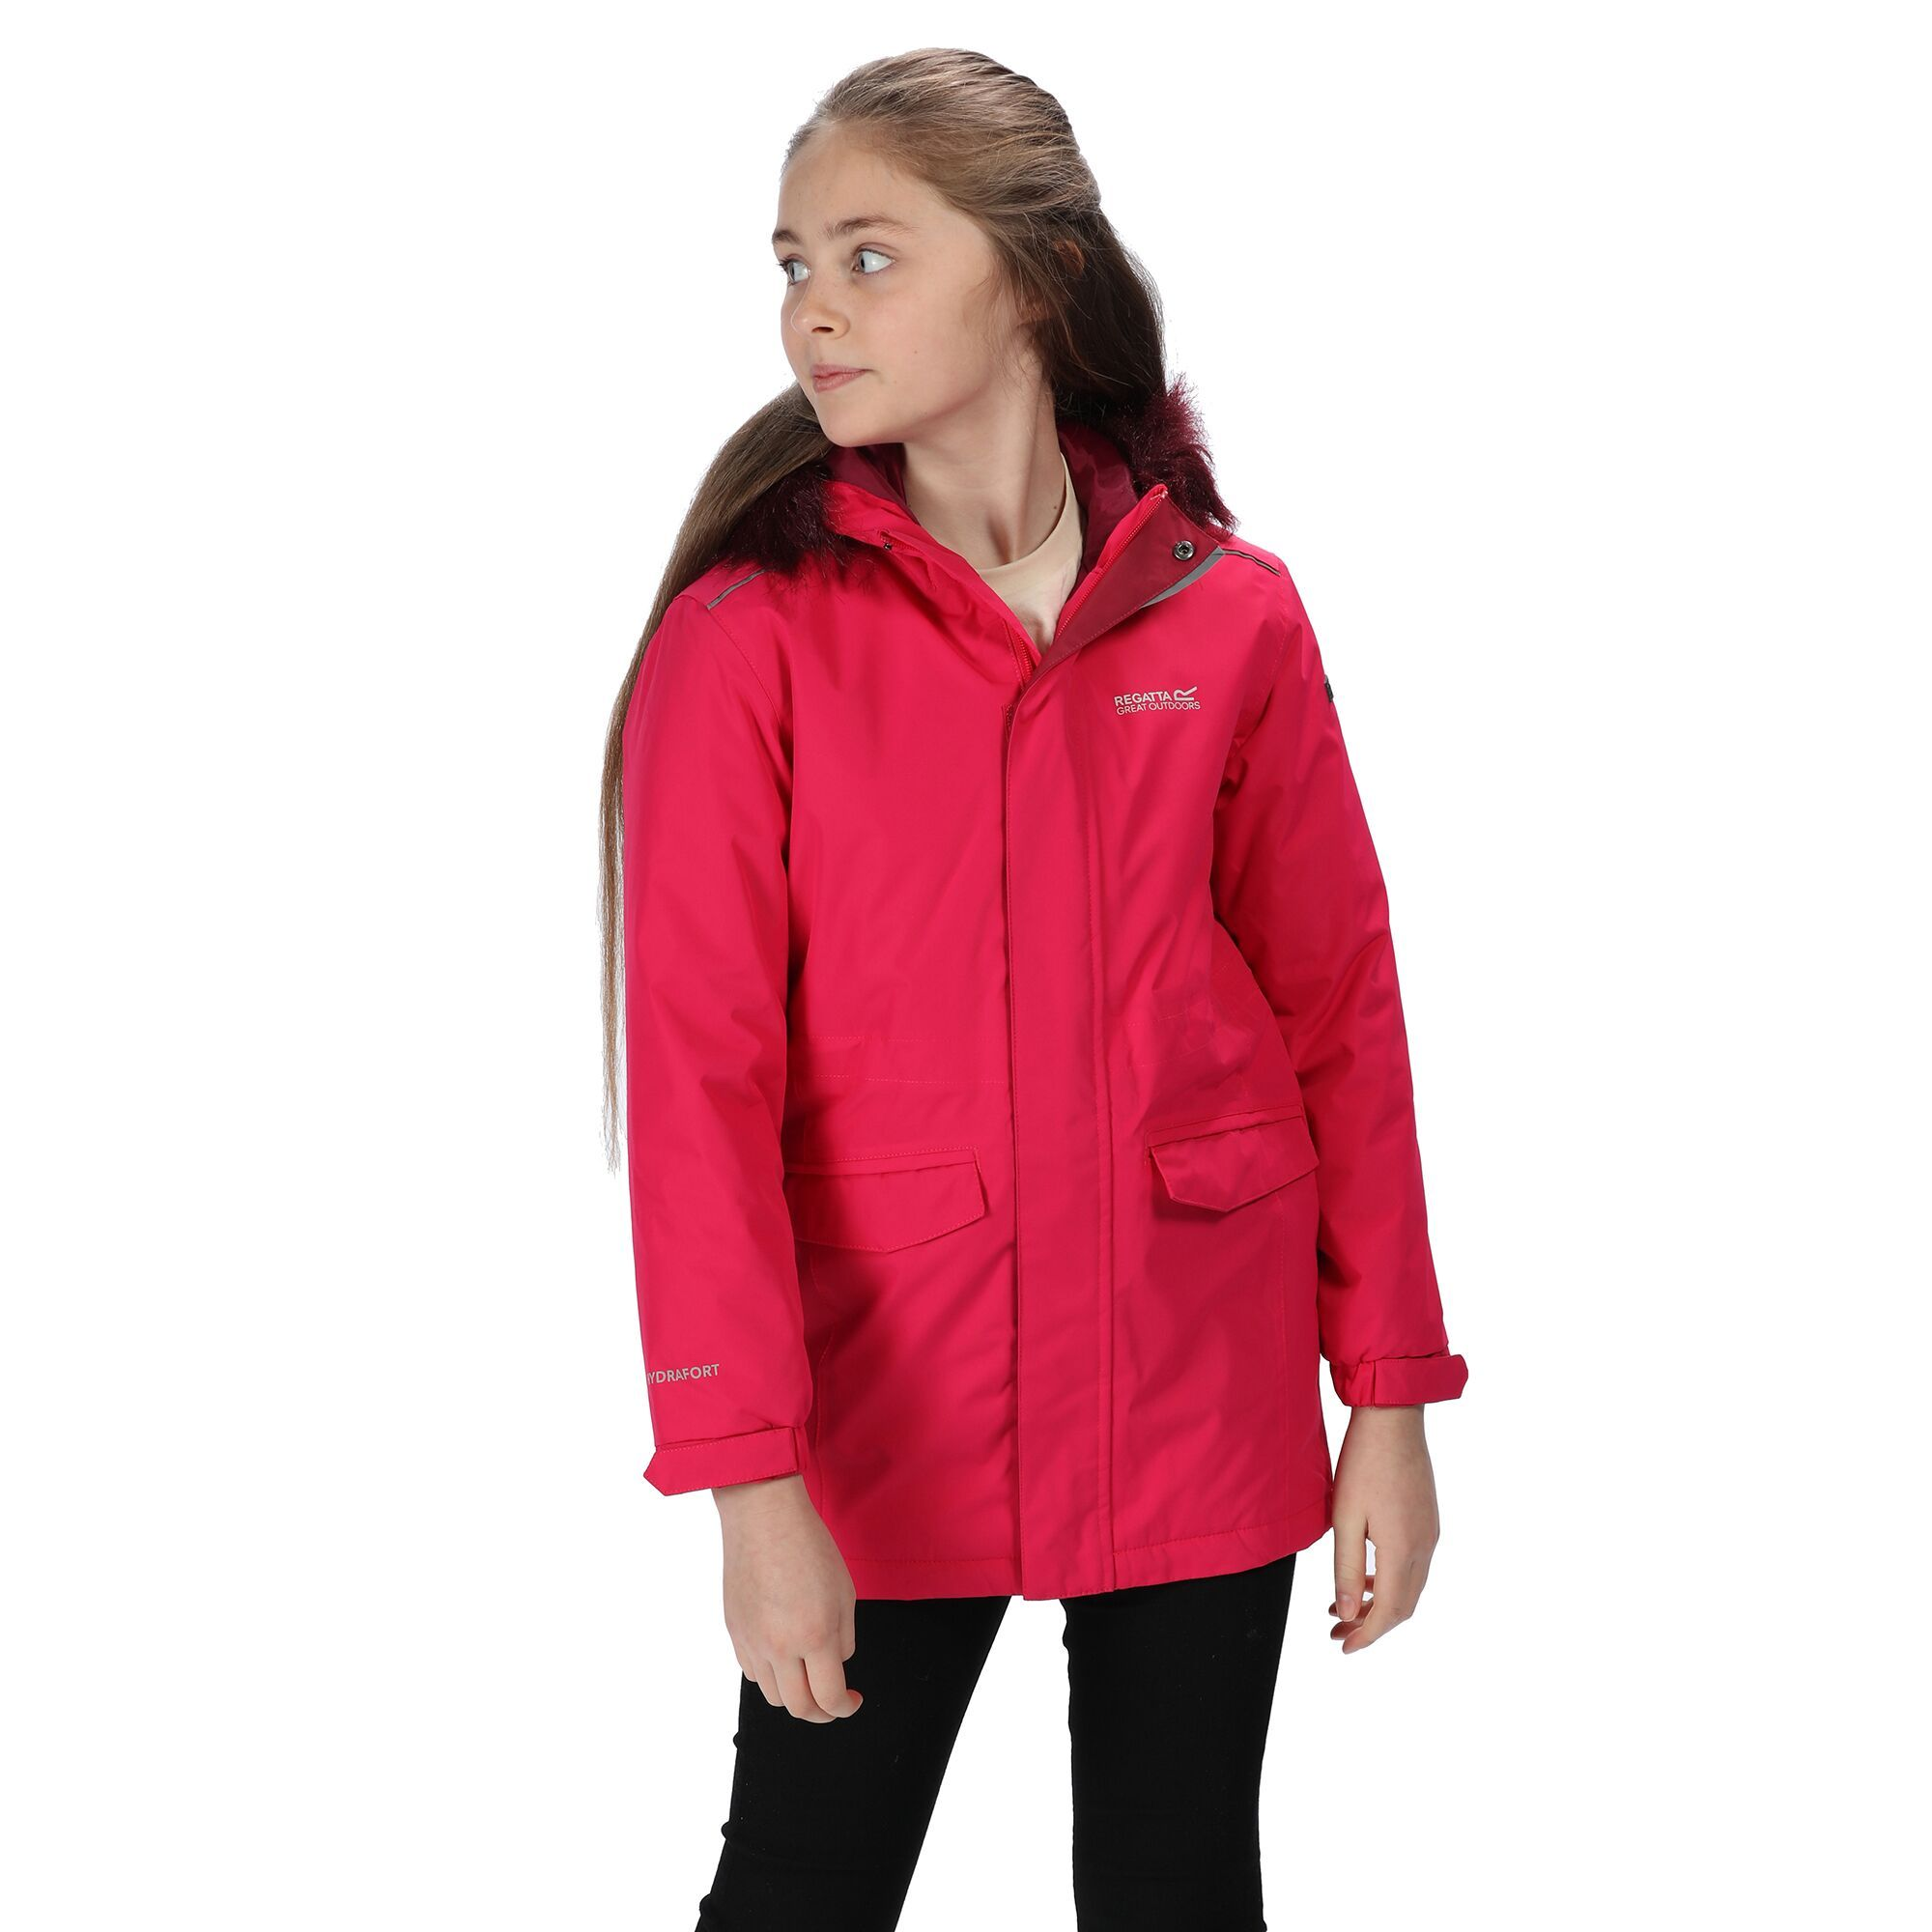 Regatta Childrens/Kids Perry Fur Trimmed Waterproof Jacket